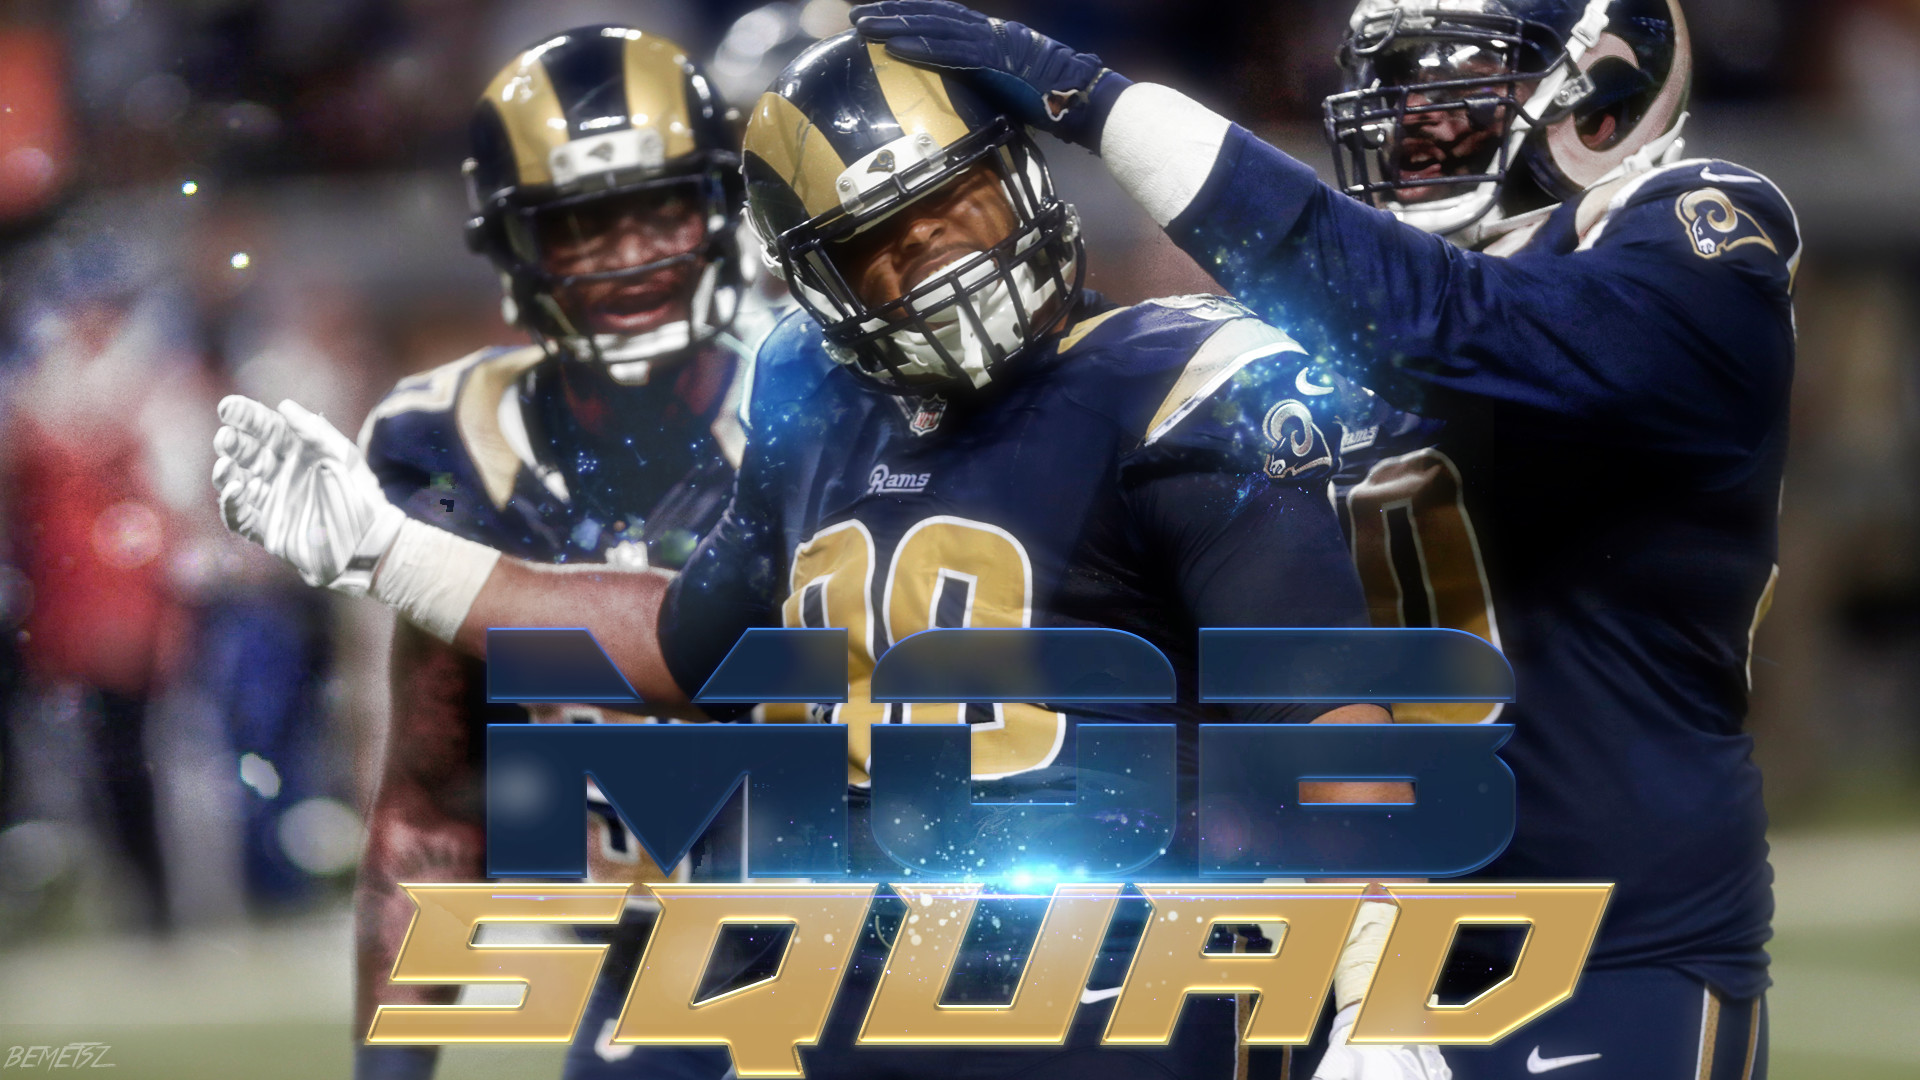 St. Louis Rams Mob Squad Wallpaper